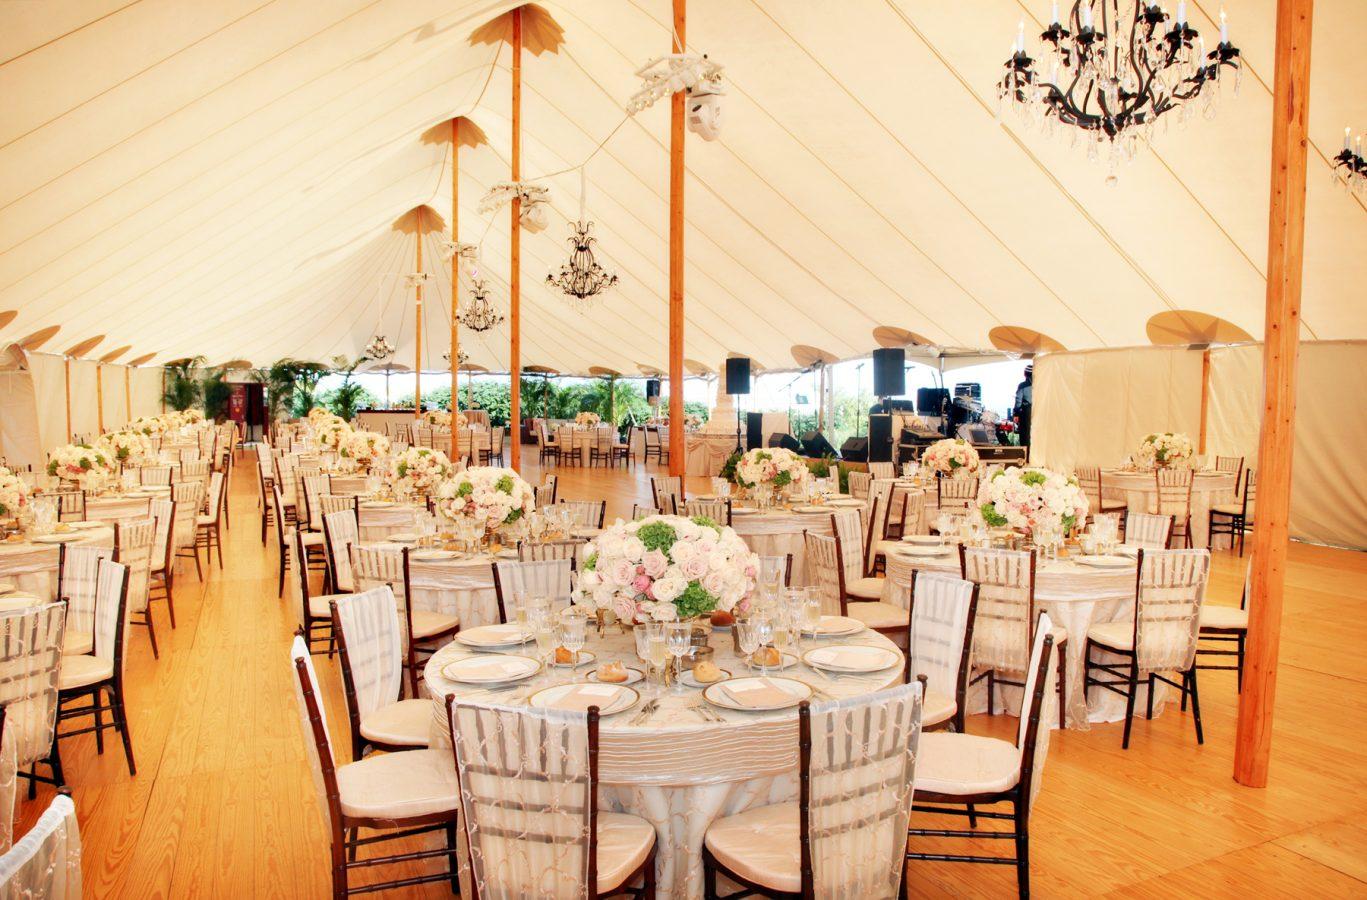 Photographs Of Chatham Bars Inn Weddings